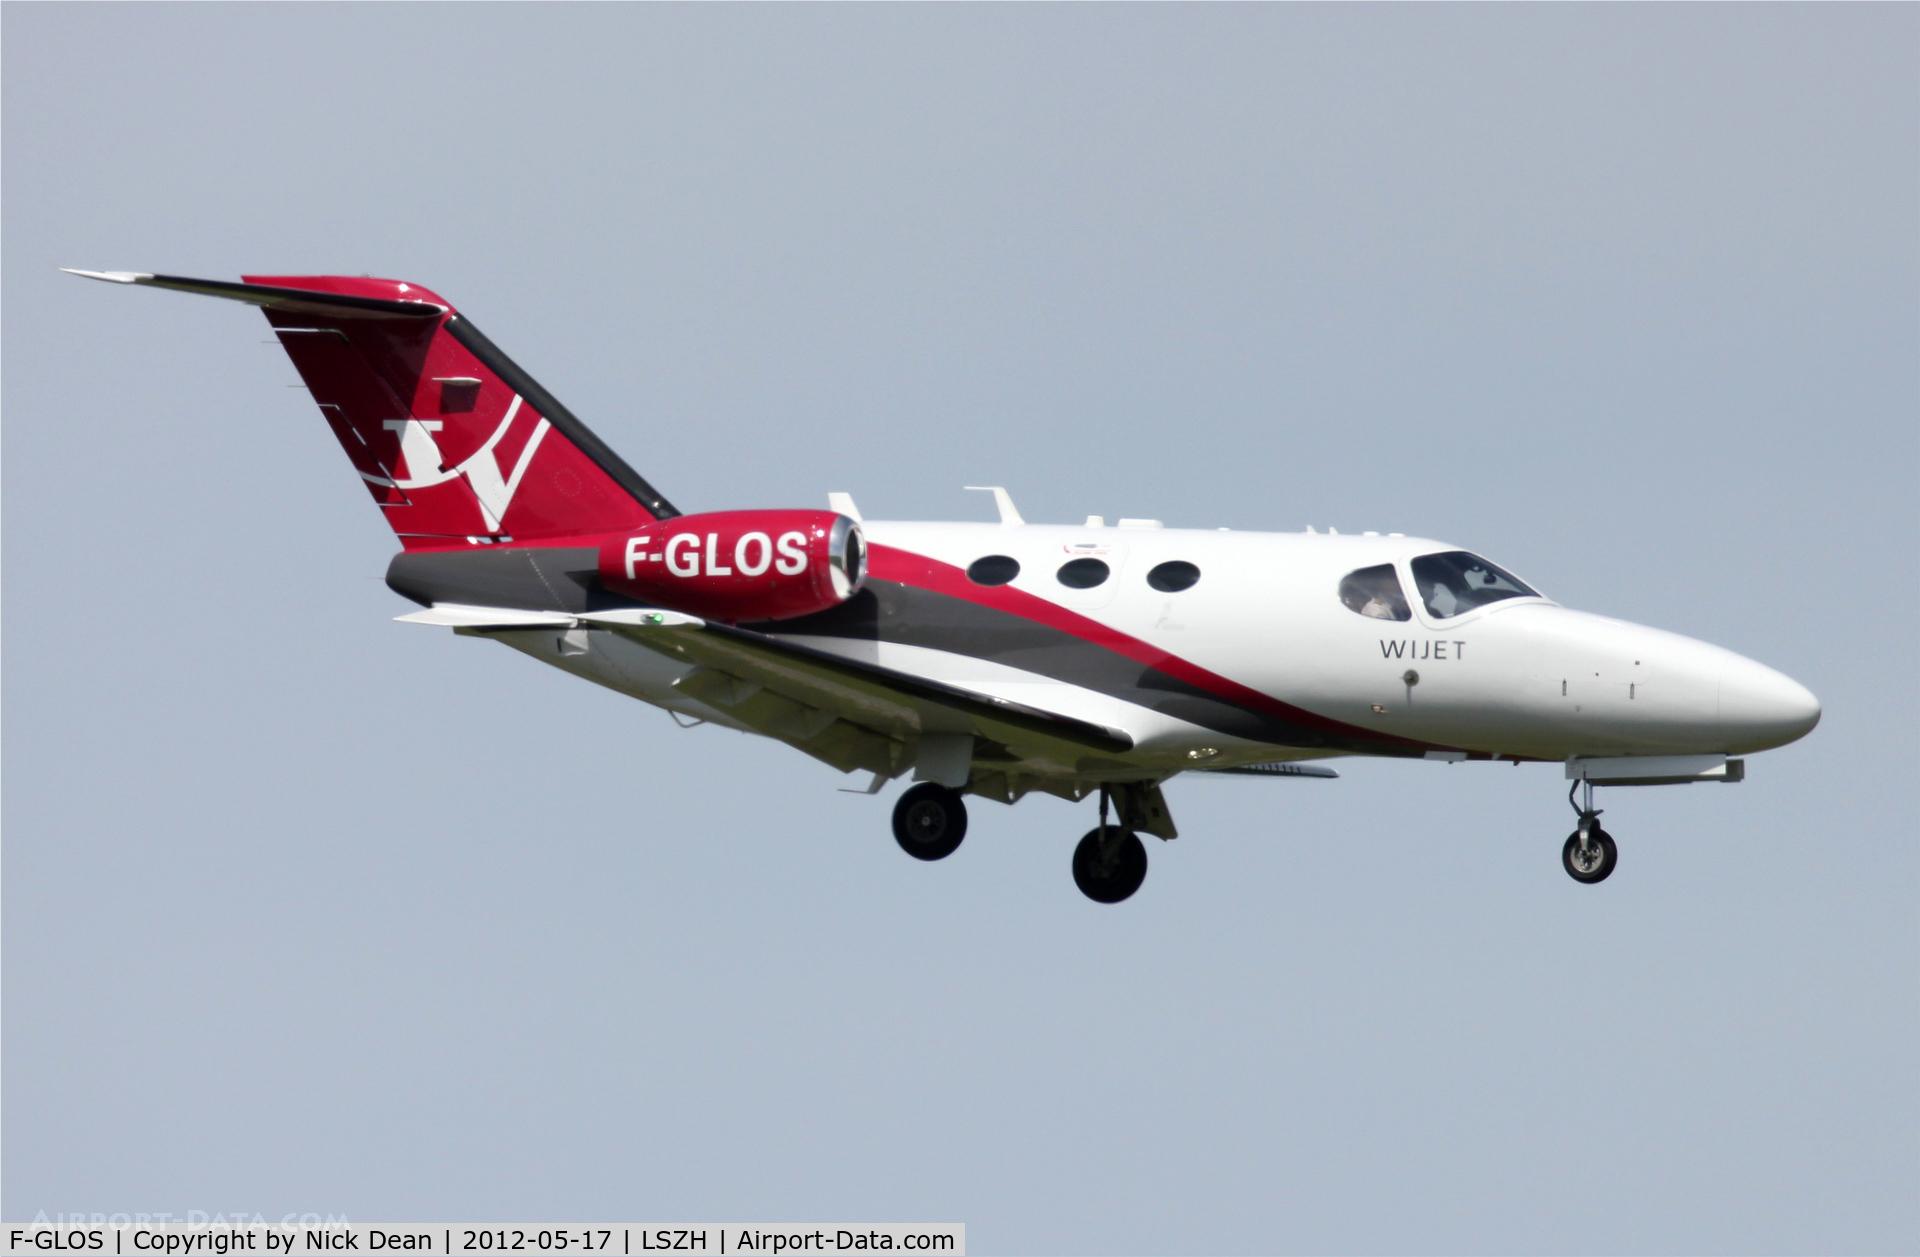 F-GLOS, 2009 Cessna 510 Citation Mustang Citation Mustang C/N 510-0169, LSZH/ZRH